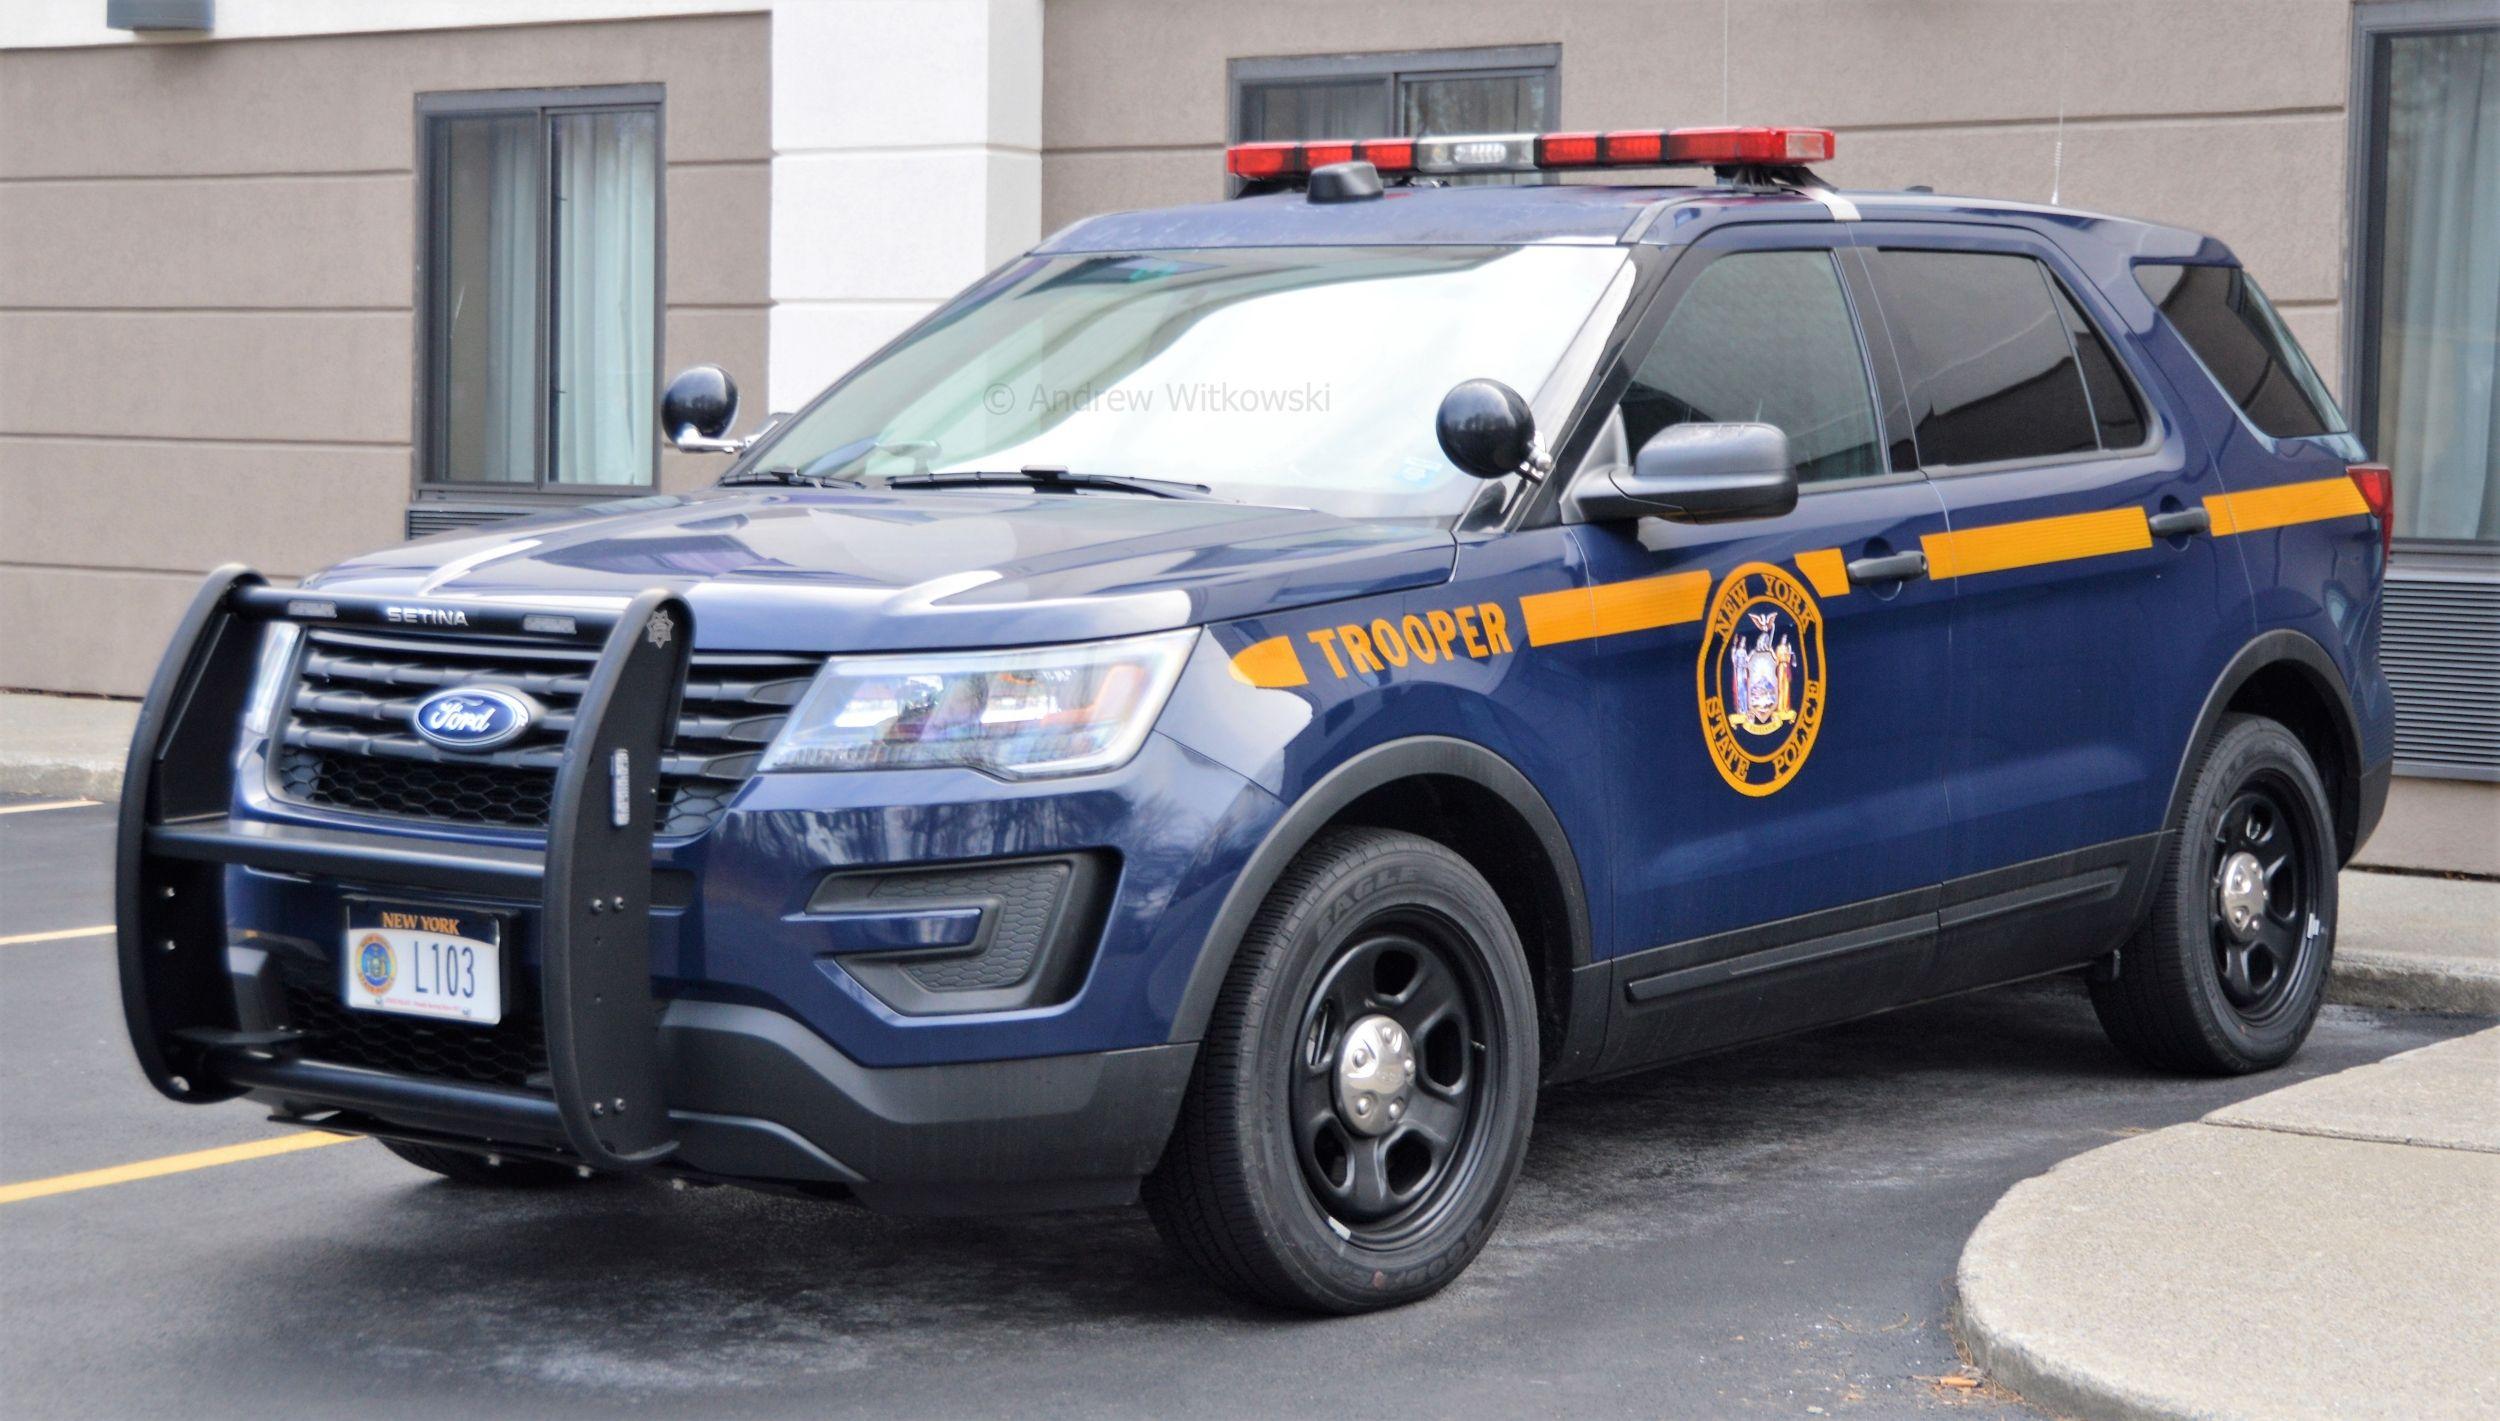 New york new york state police ford police utility interceptor vehicle